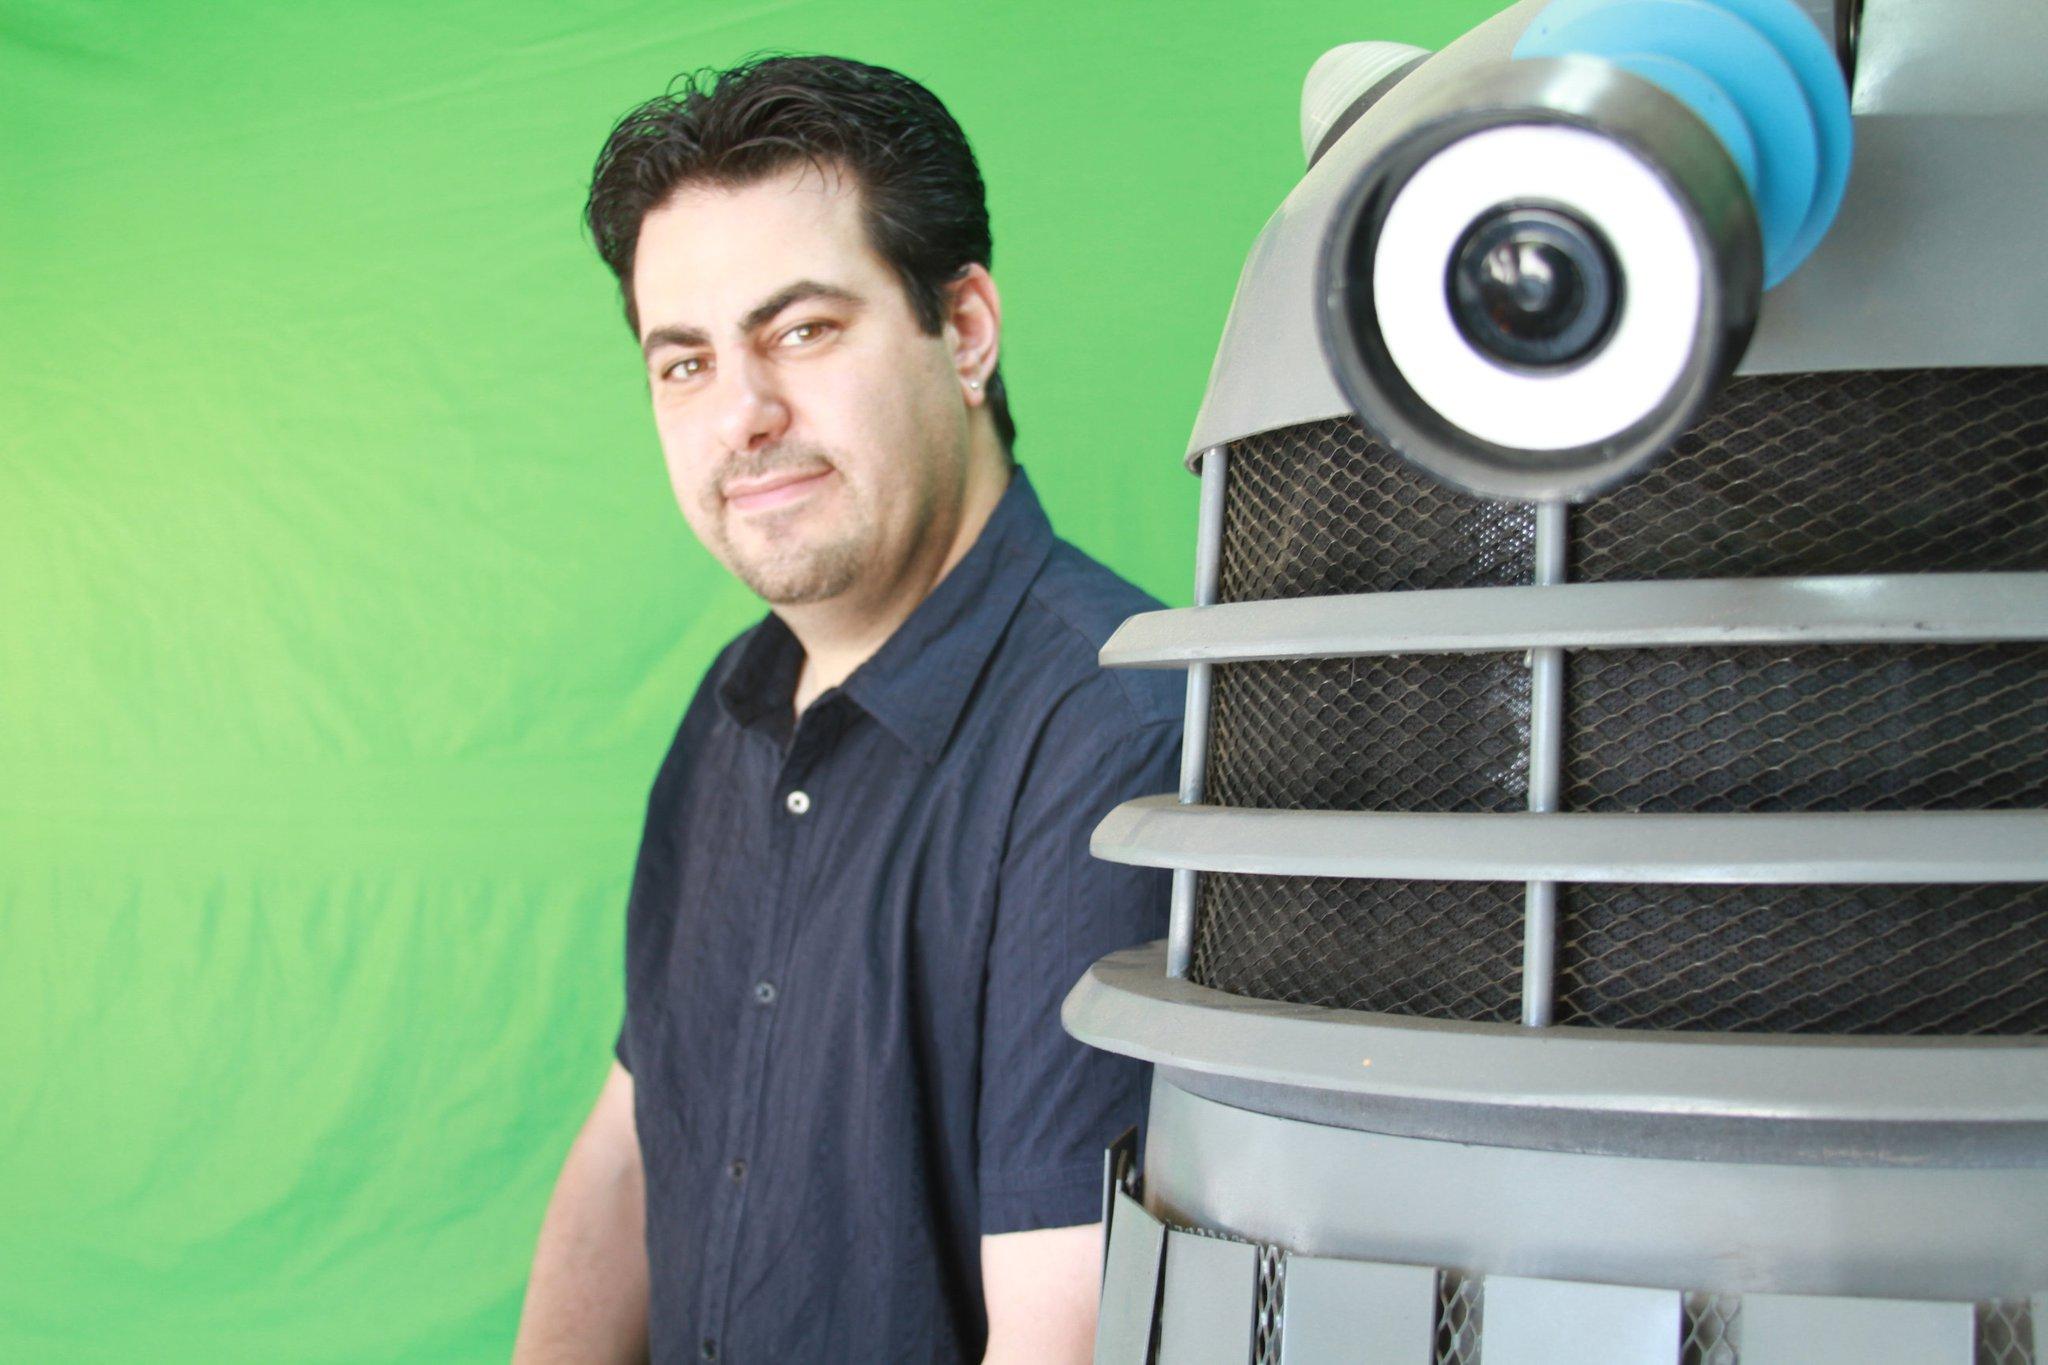 Paul Salamoff Master of the Daleks